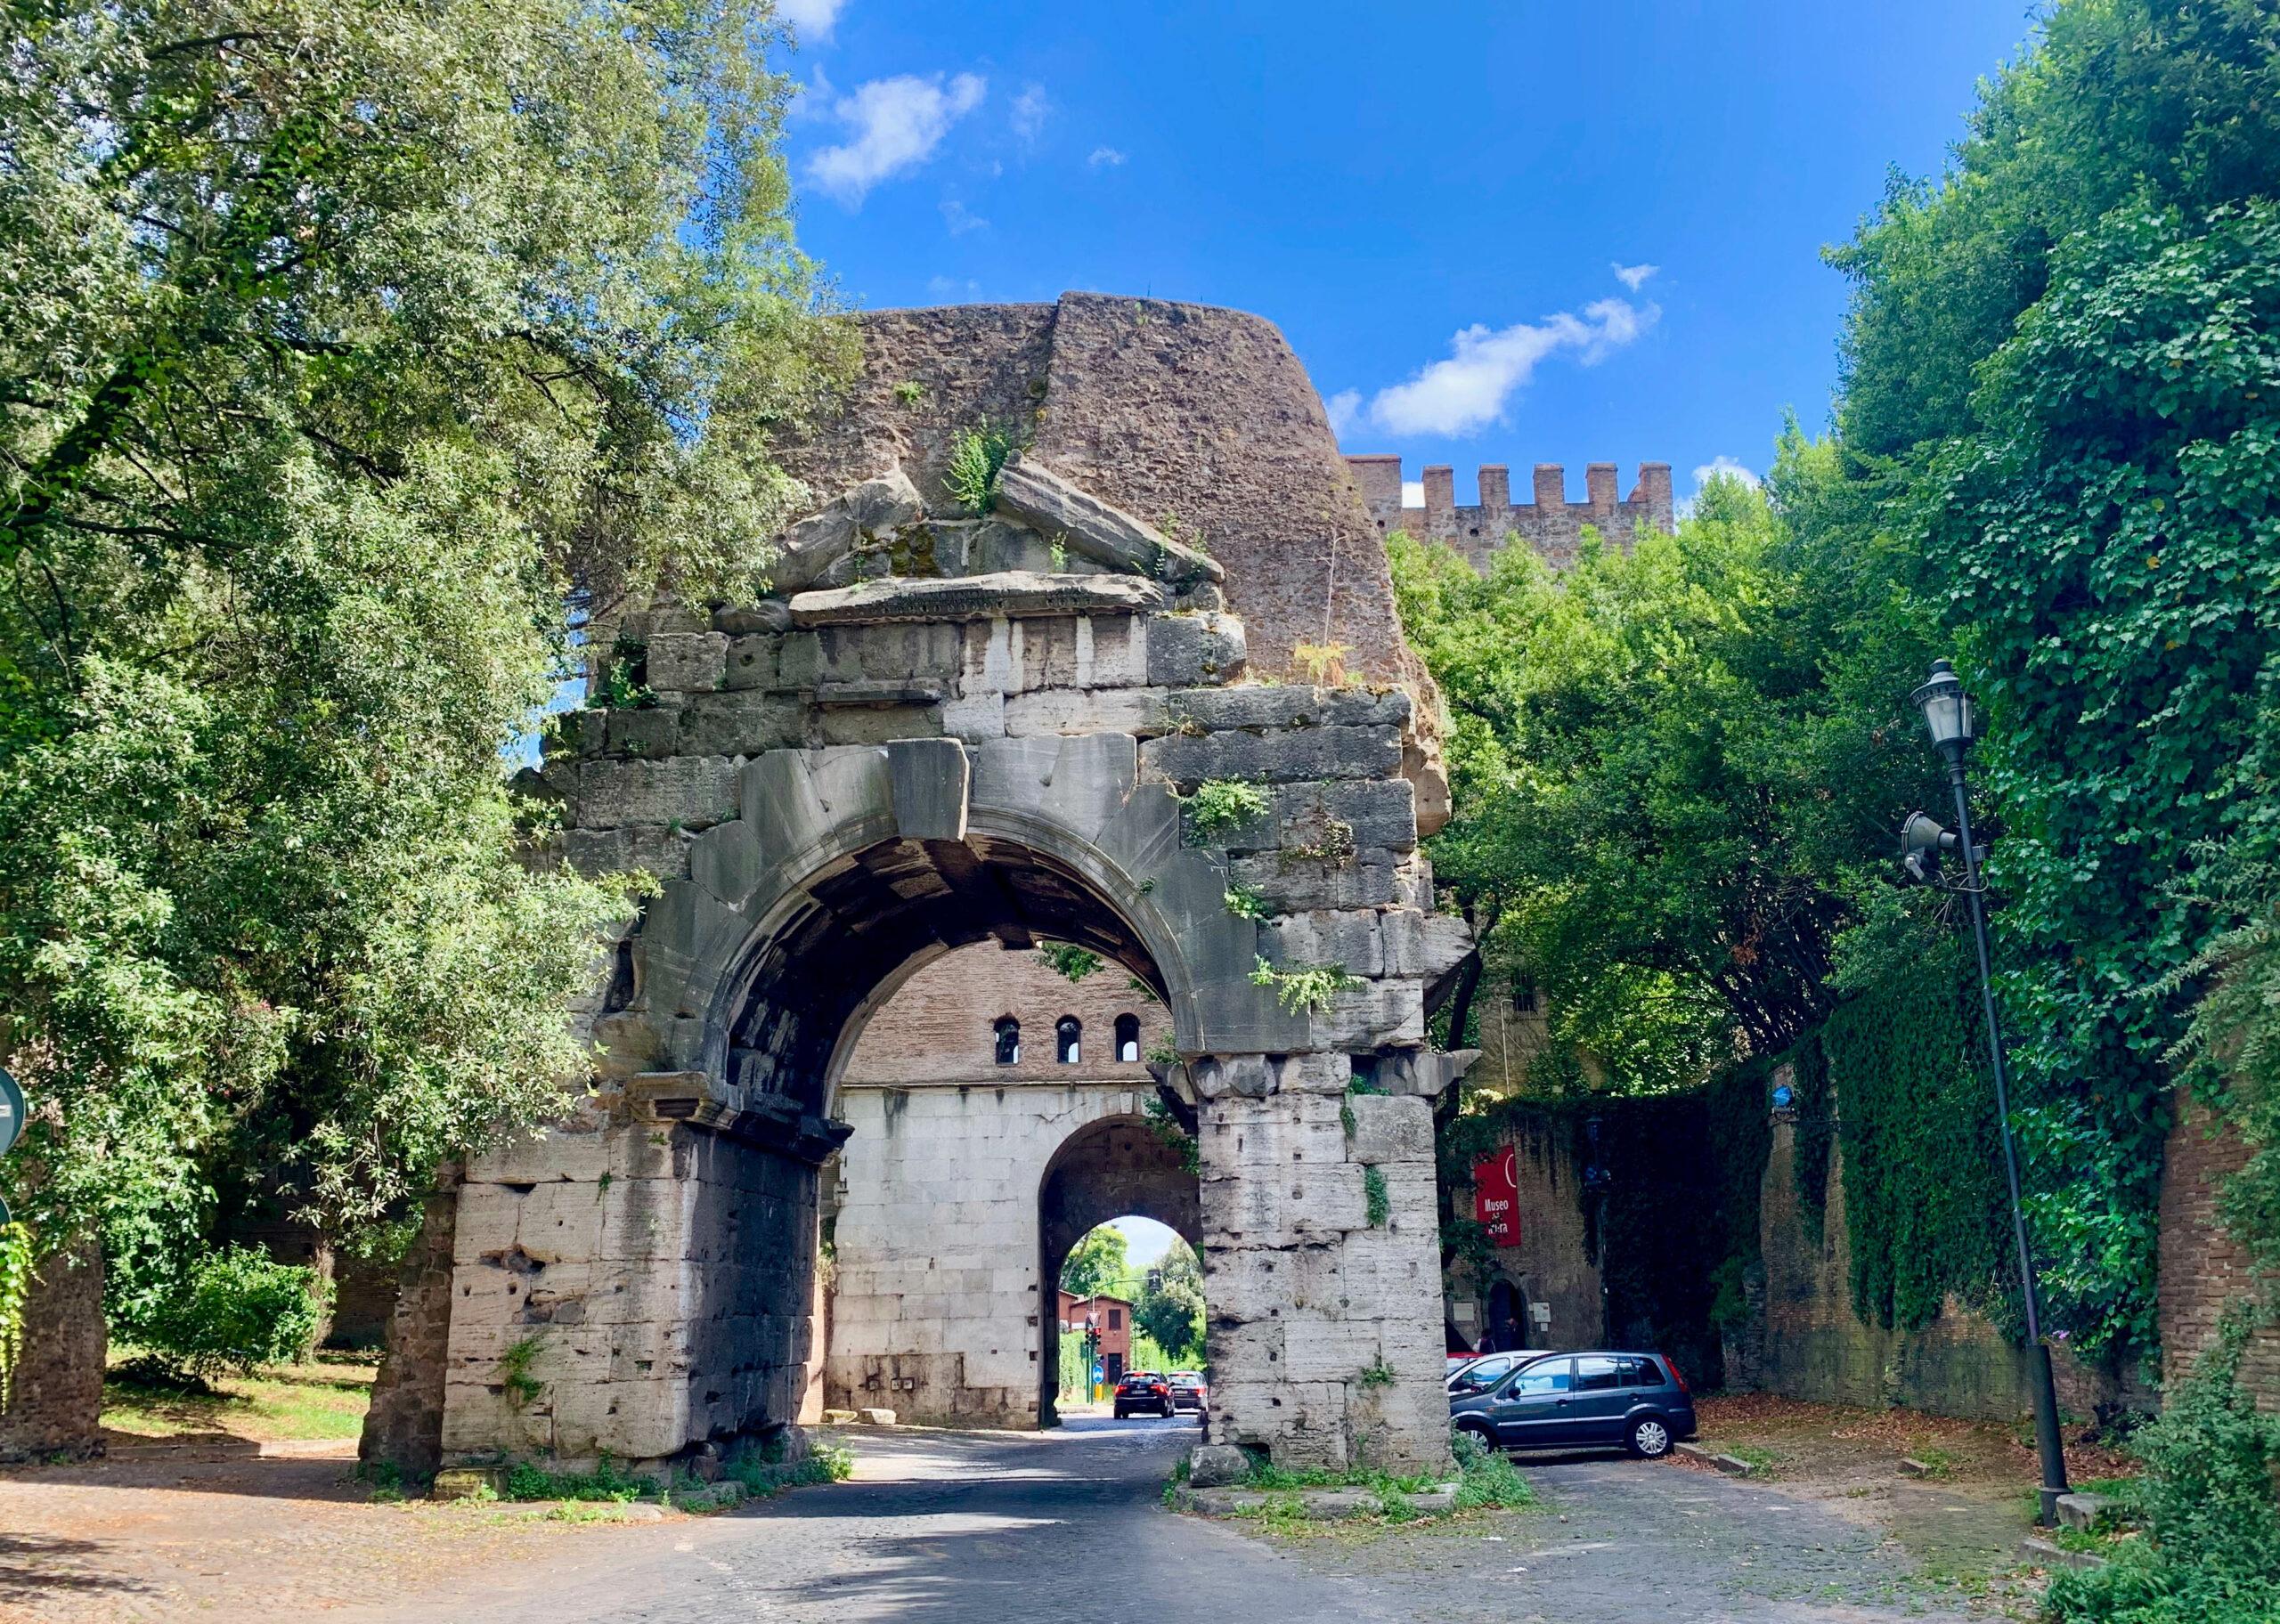 Porta san Sebastian Museo della mura, Rom